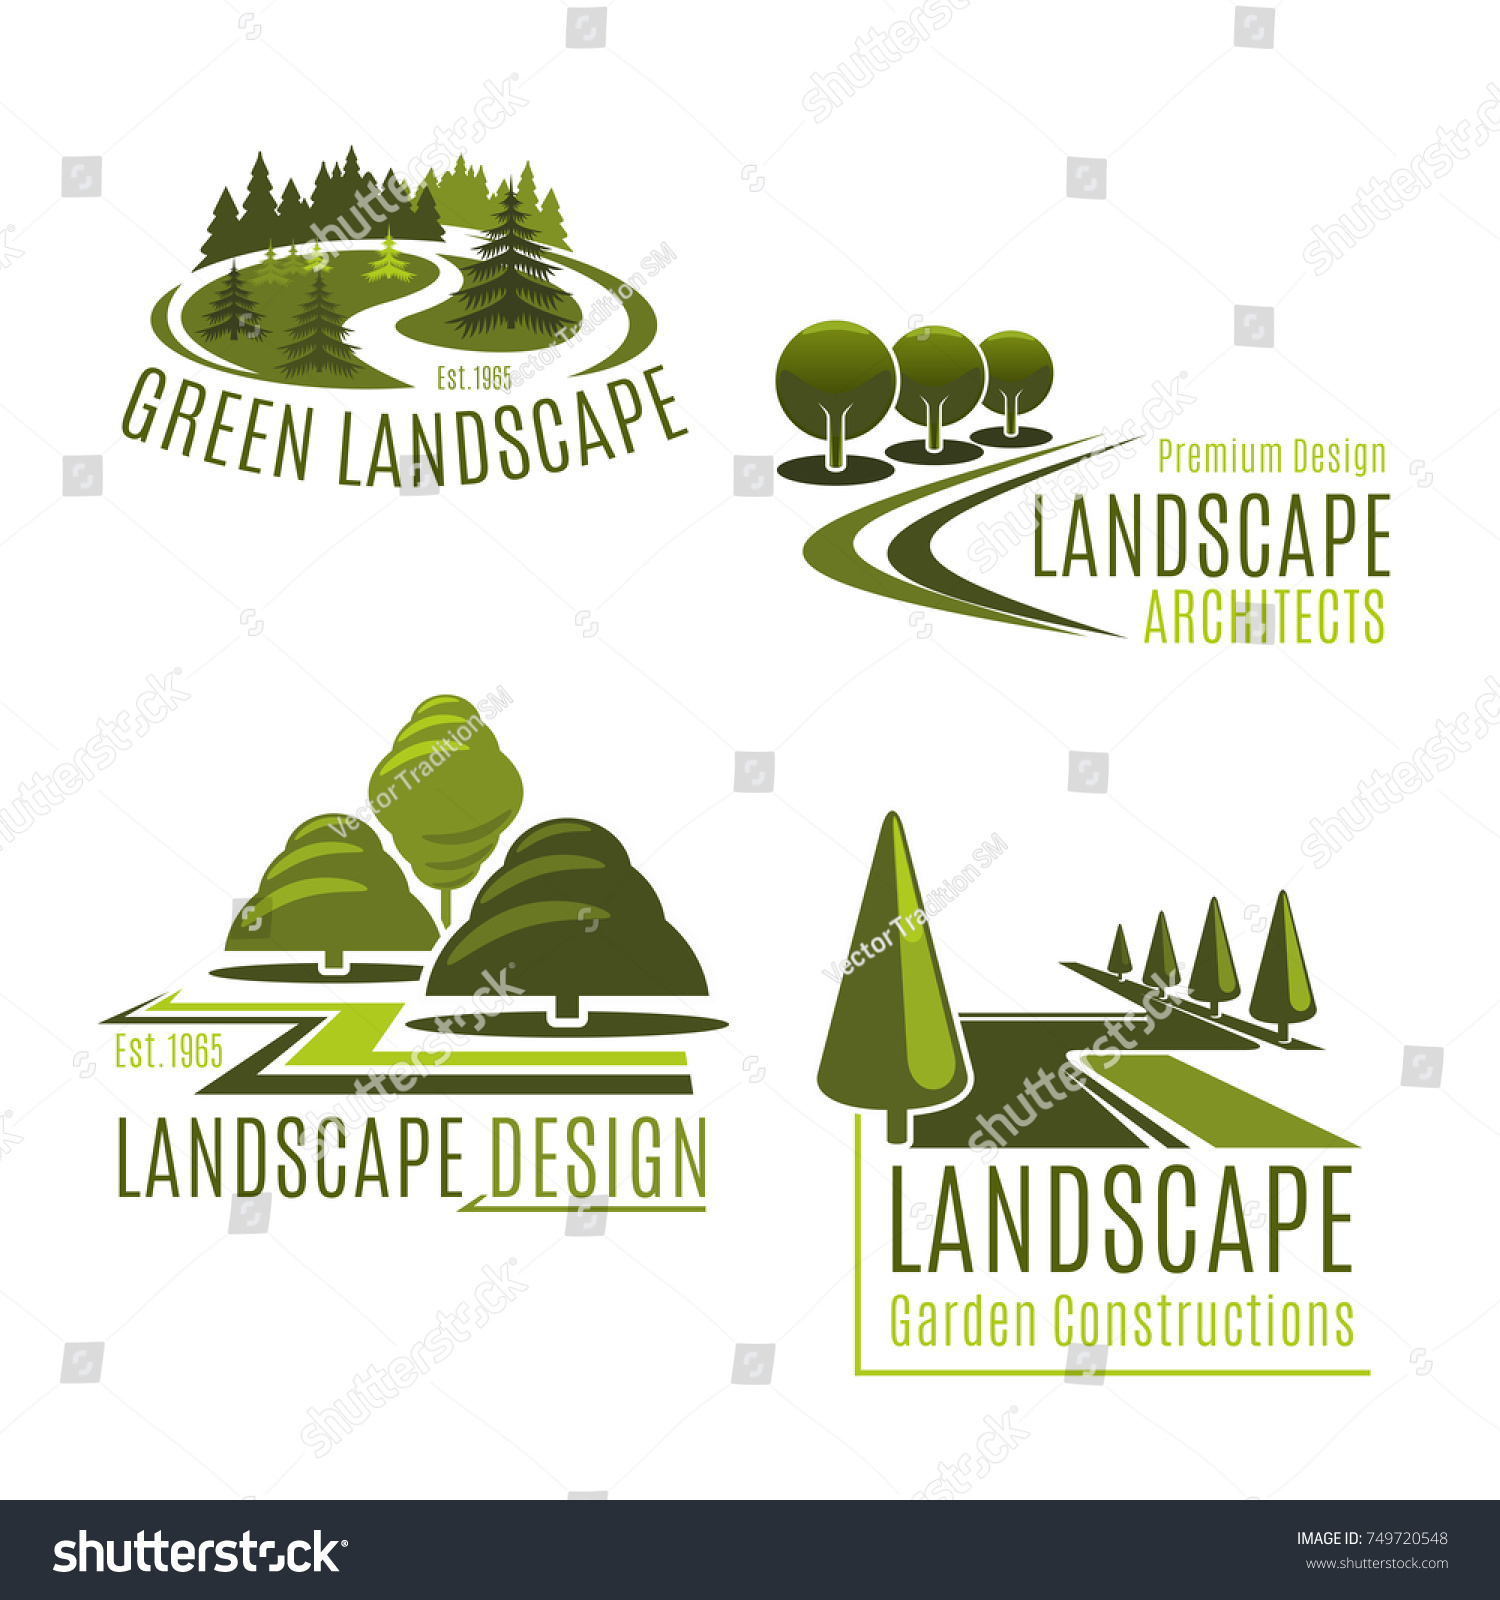 Gardening Green Landscape Design Company Icons Image Vectorielle  # Bordure De Jardin Green Park